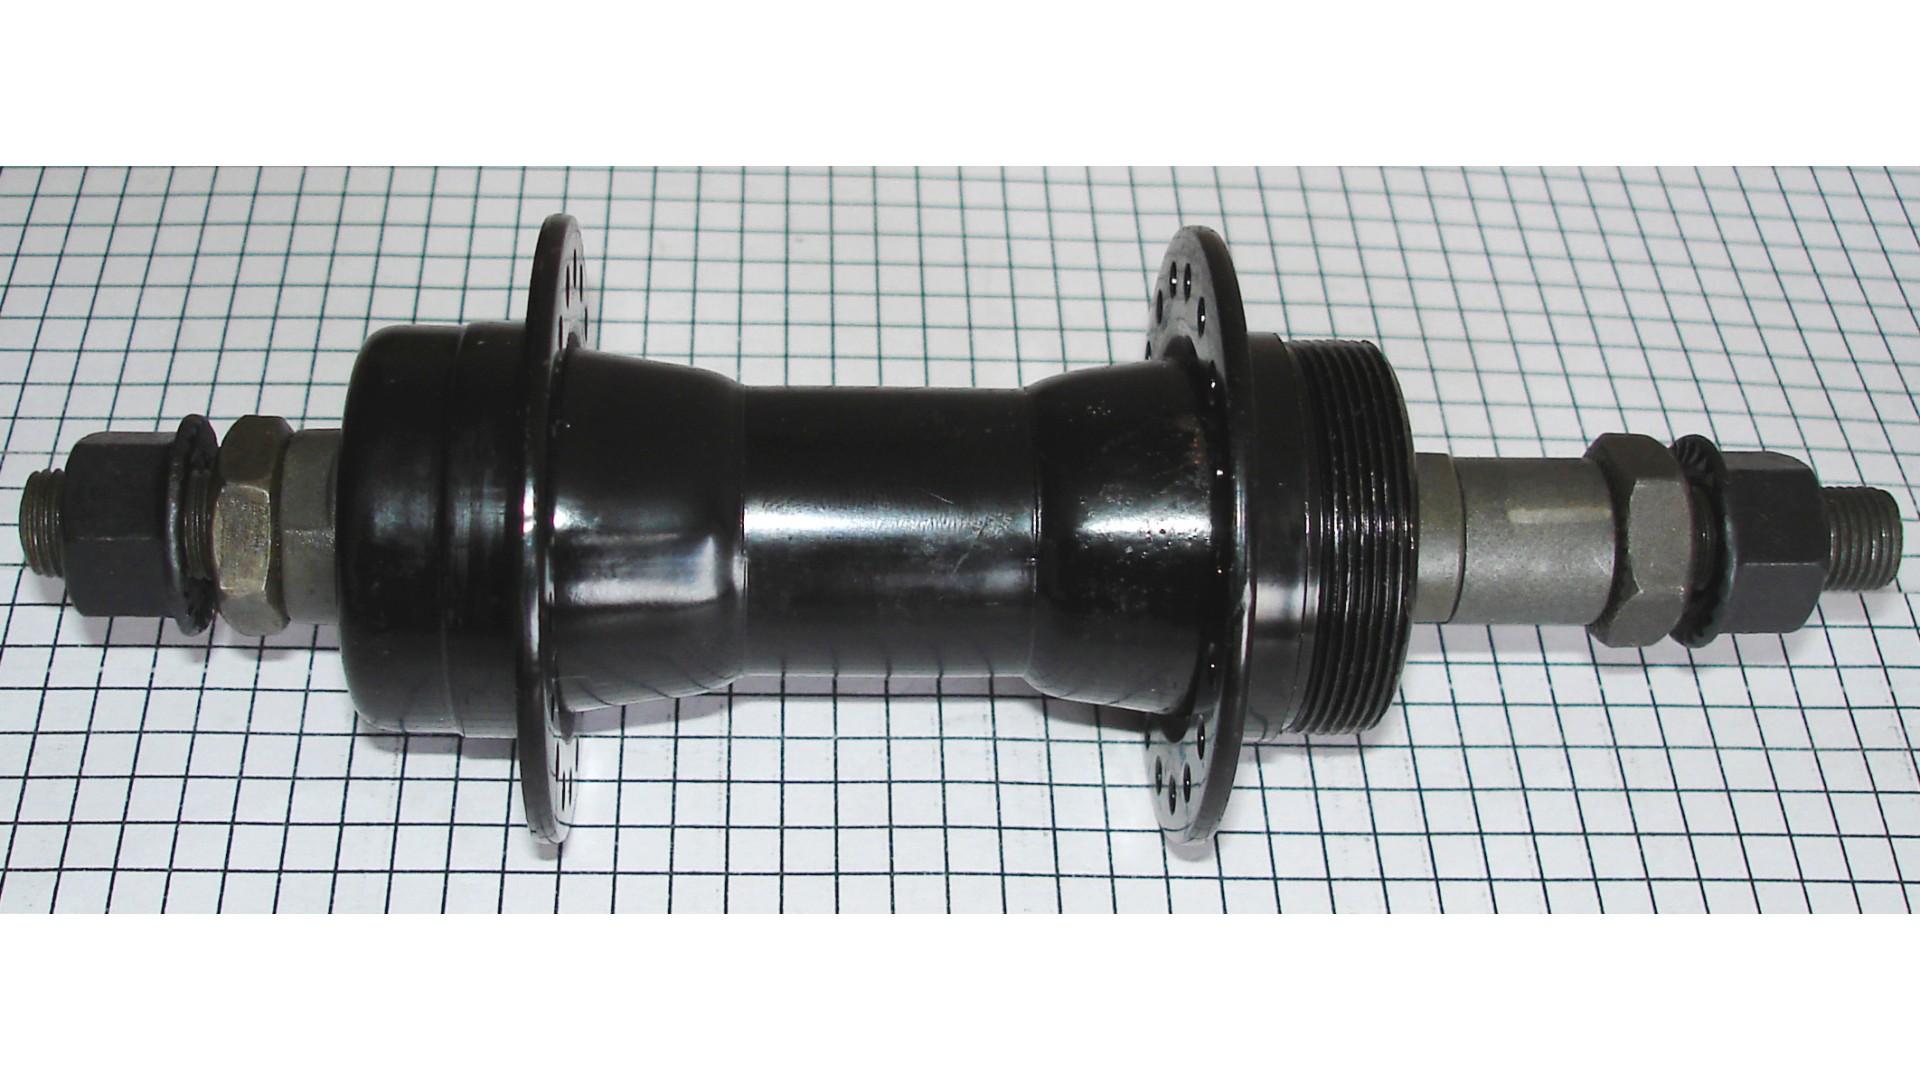 Втулка задн. Quando KT-122R под V-brake 36H 165mm, 6,7 ск. на гайках стальная черн.